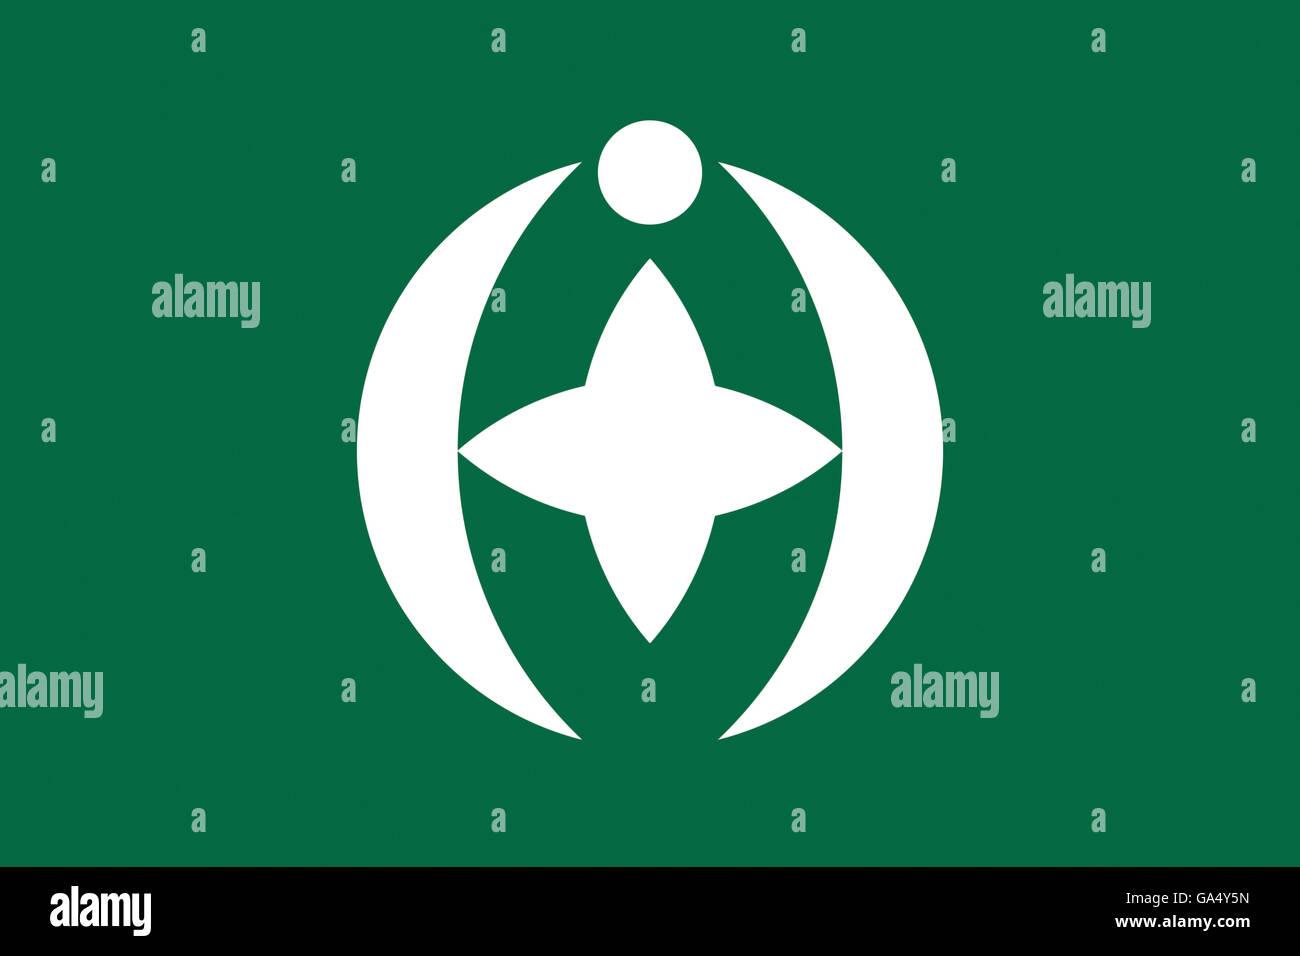 Japan Chiba prefecture Chiba city flag illustration - Stock Image